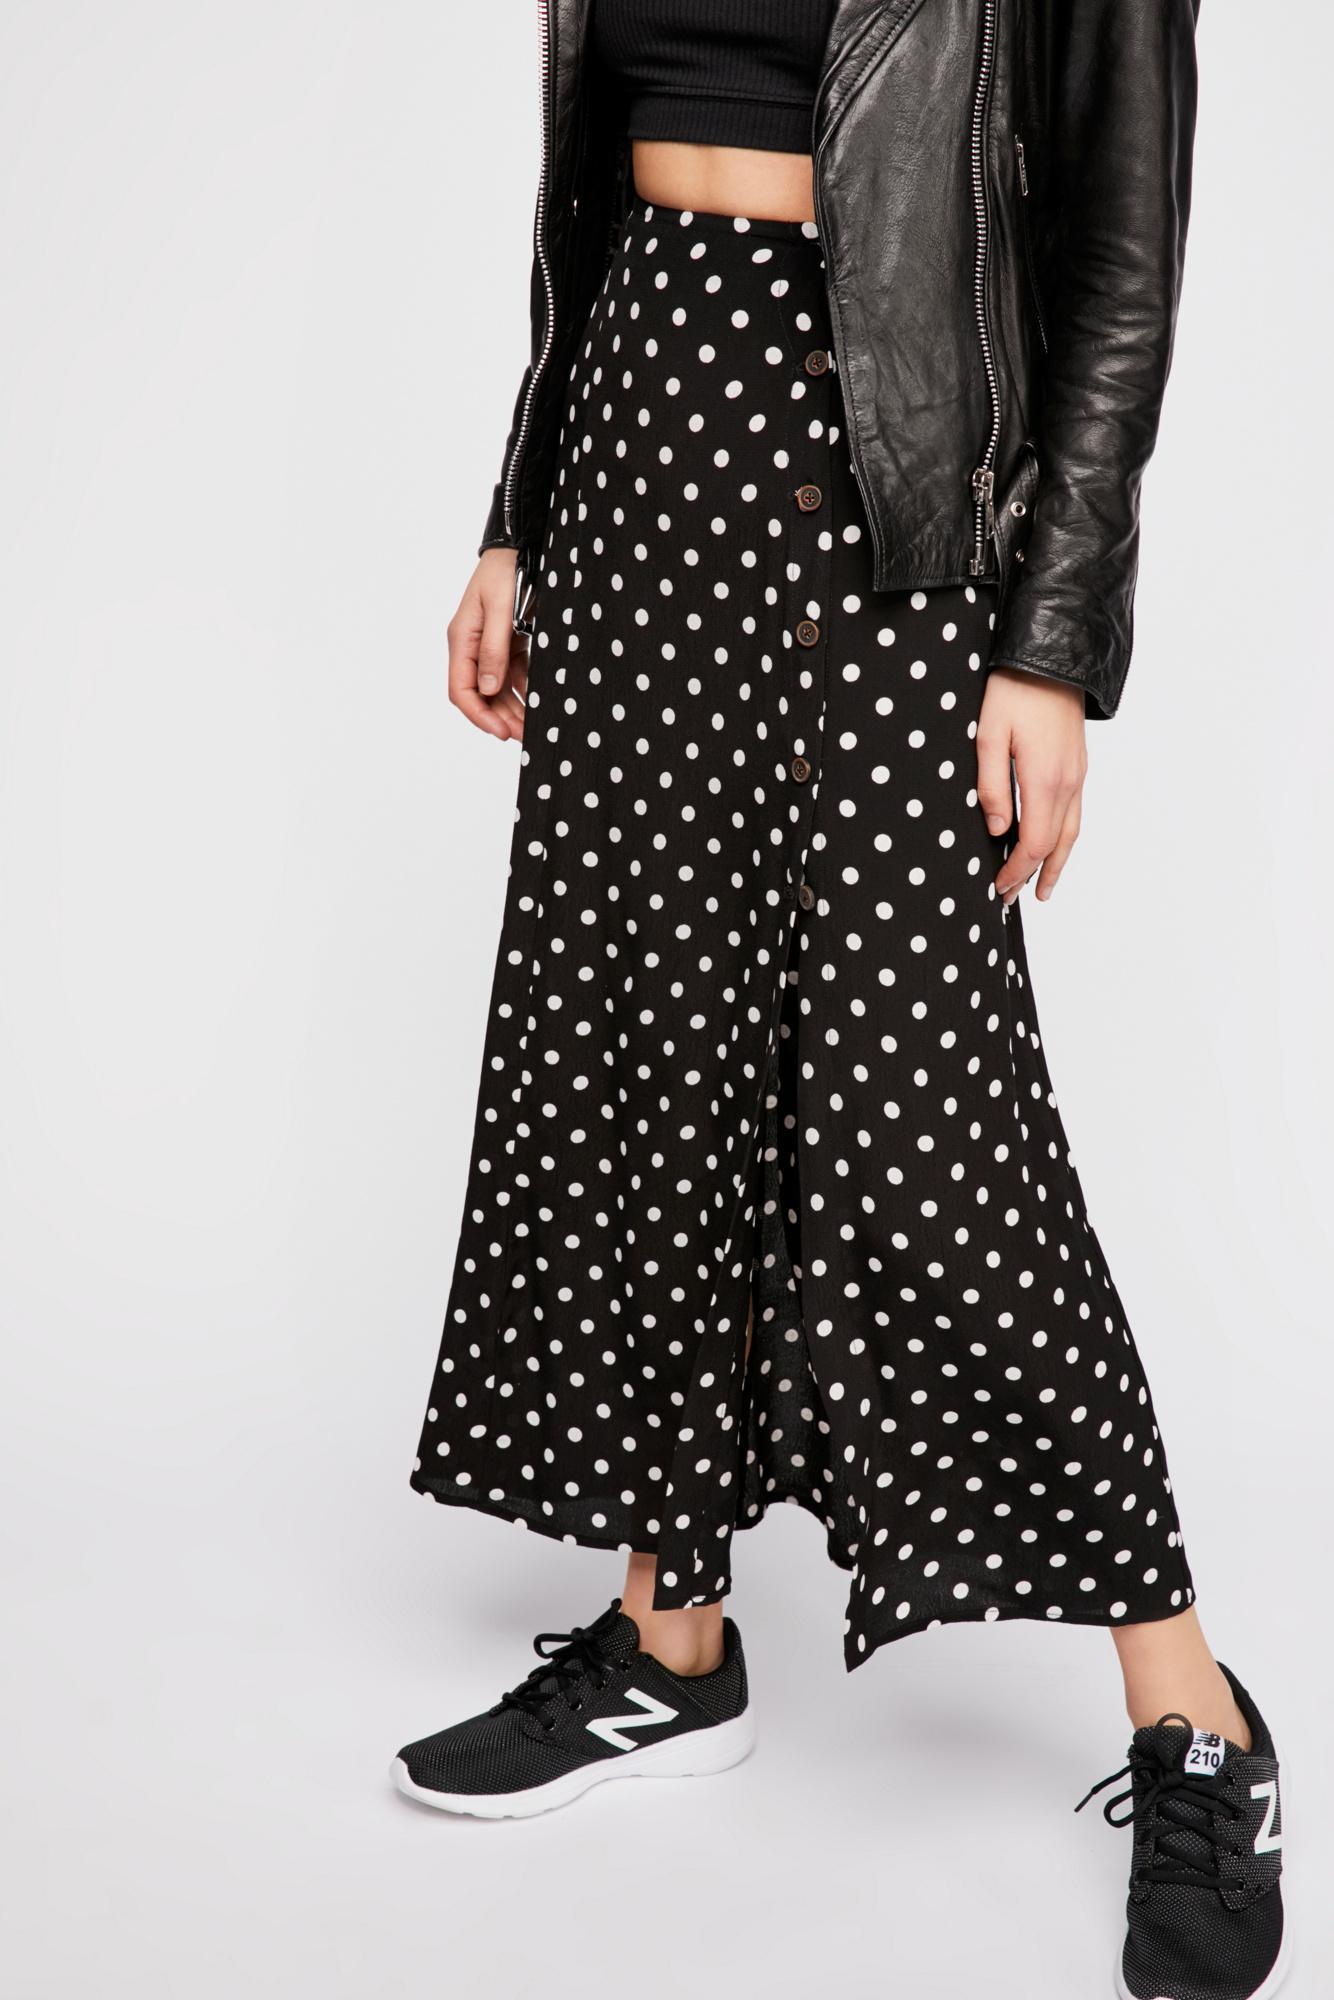 66cf7b8e6fd684 Gallery. Women's Button-Down Skirts Women's Midi Skirts